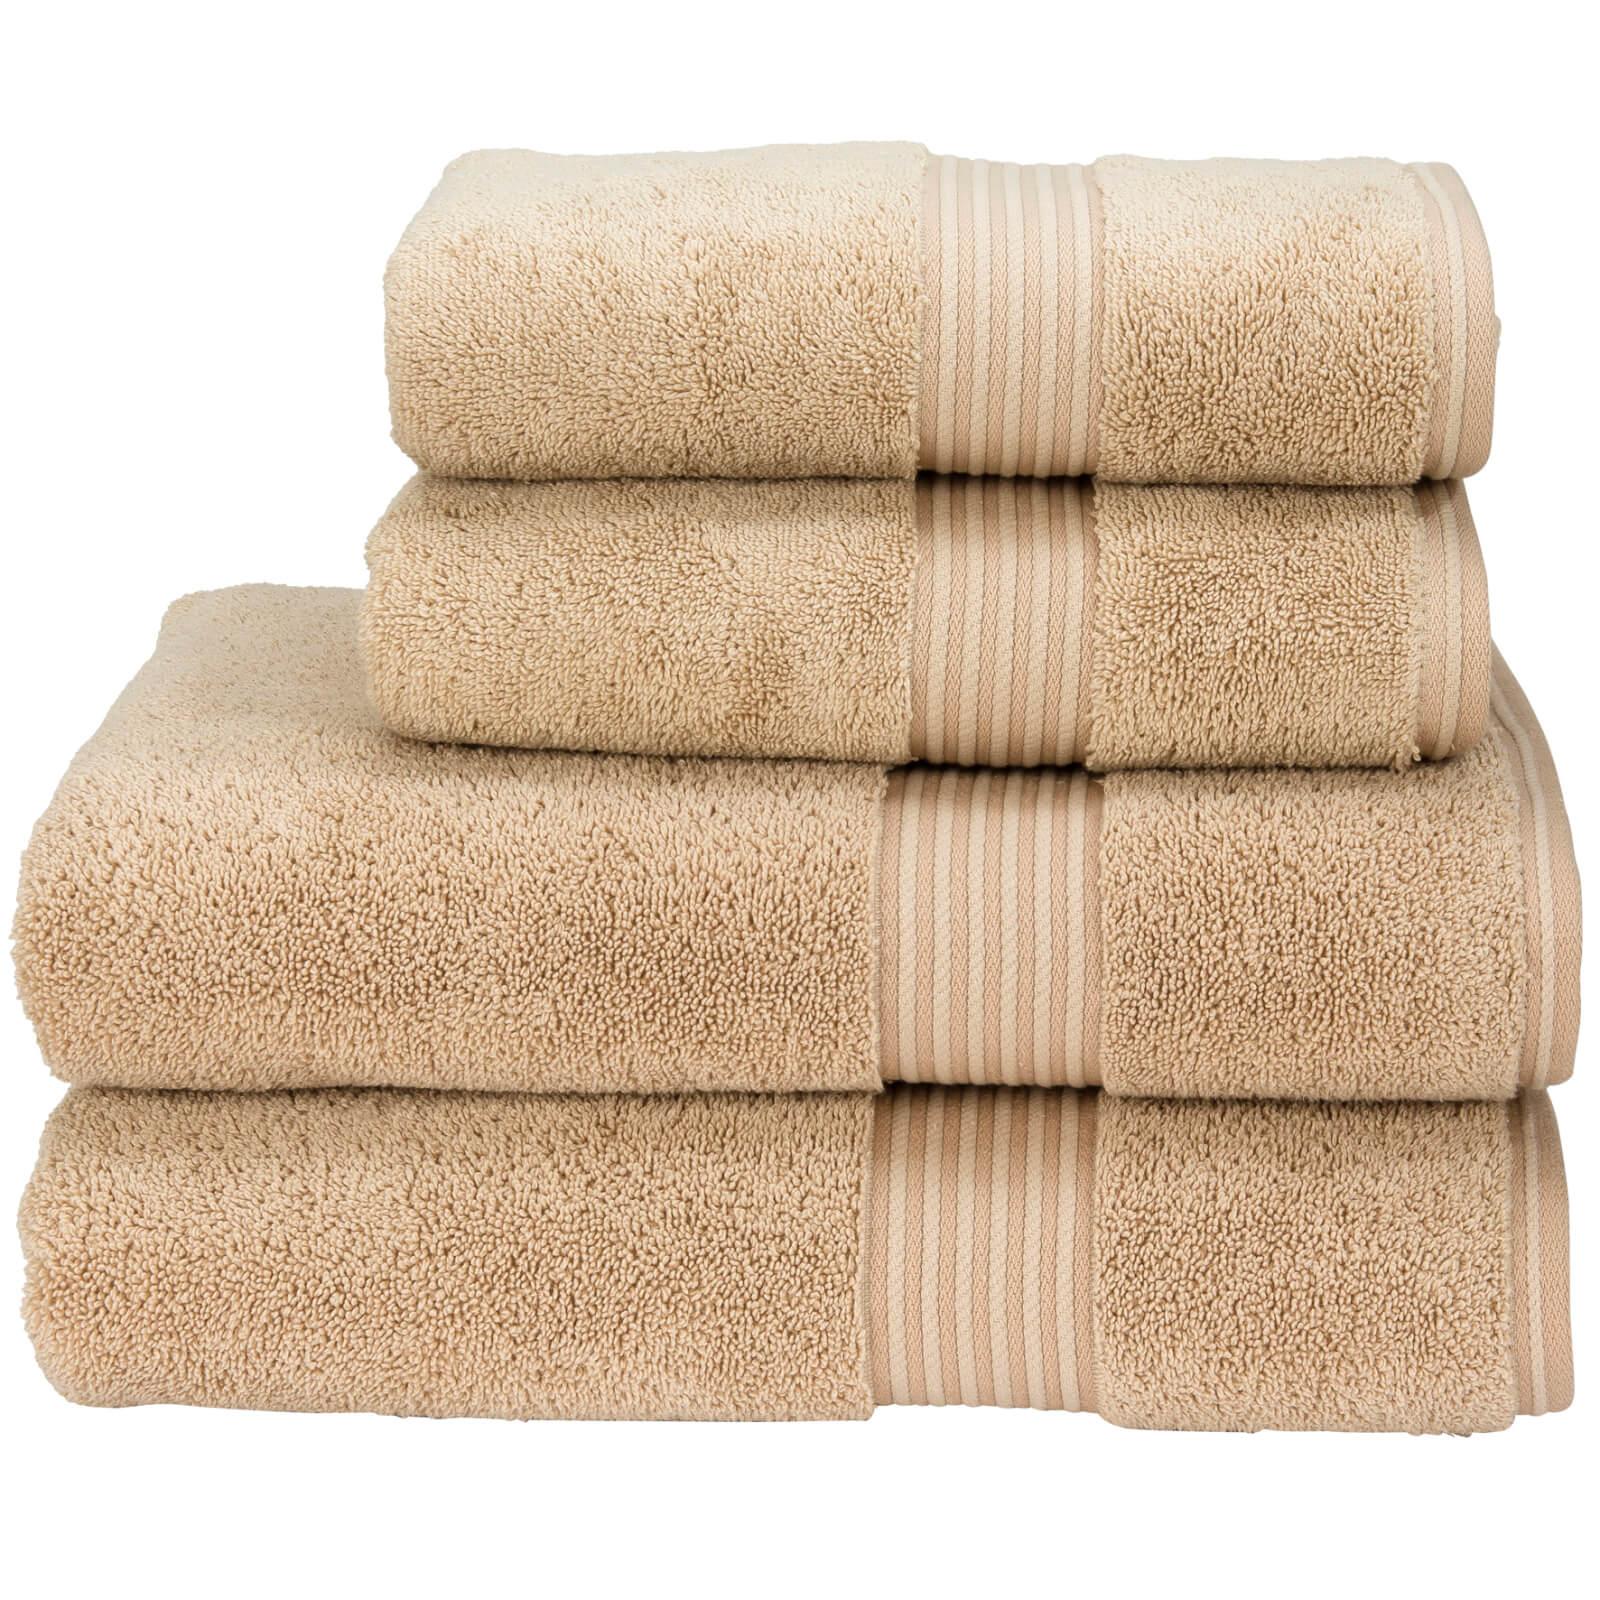 Christy Supreme Hygro Towel Range - Stone - Bath Towel (Set of 2) - Stone